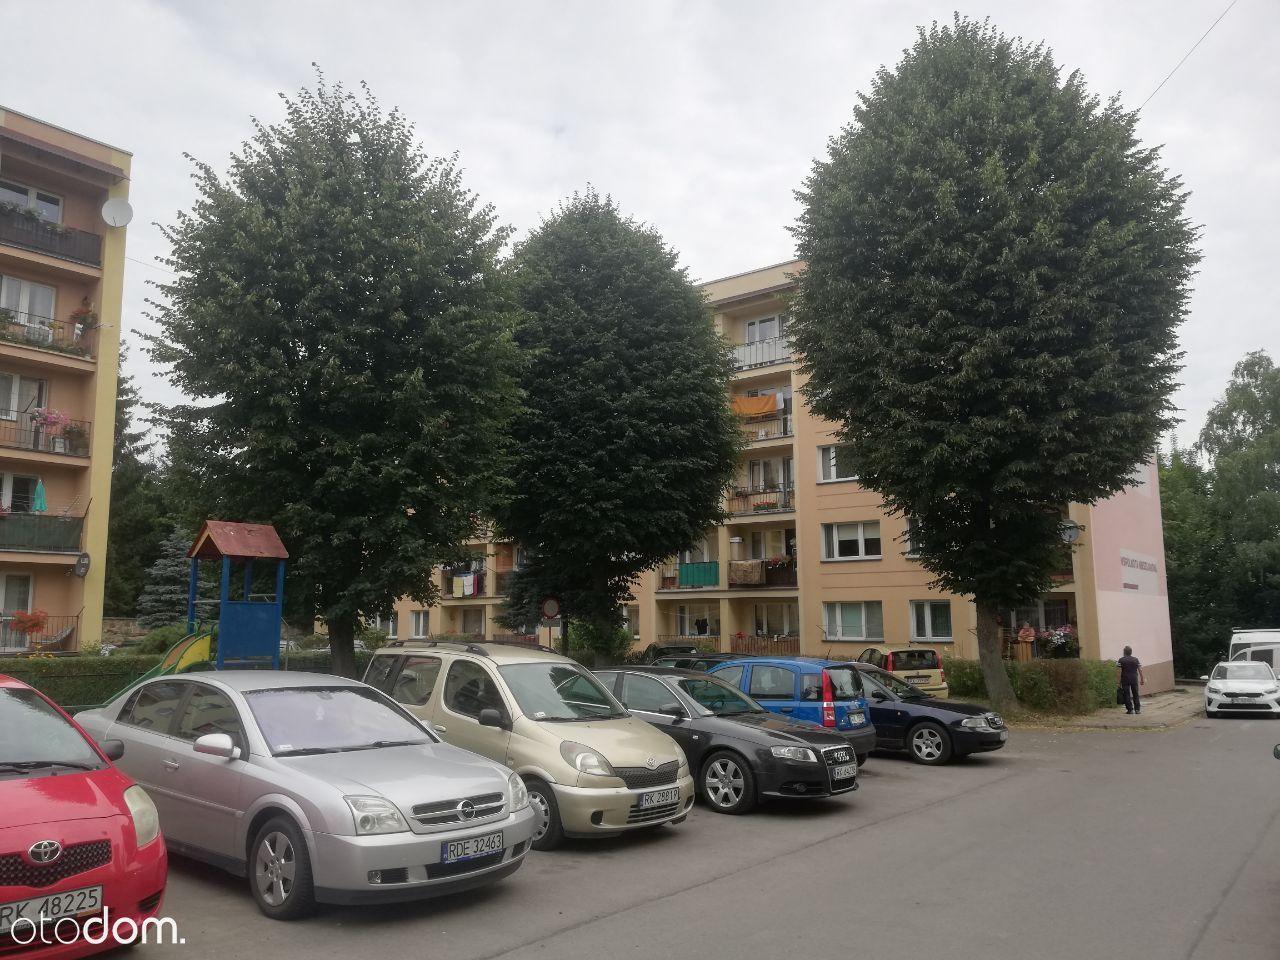 Mieszkanie Krosno/Staszica/ - 2 pok, 45m2